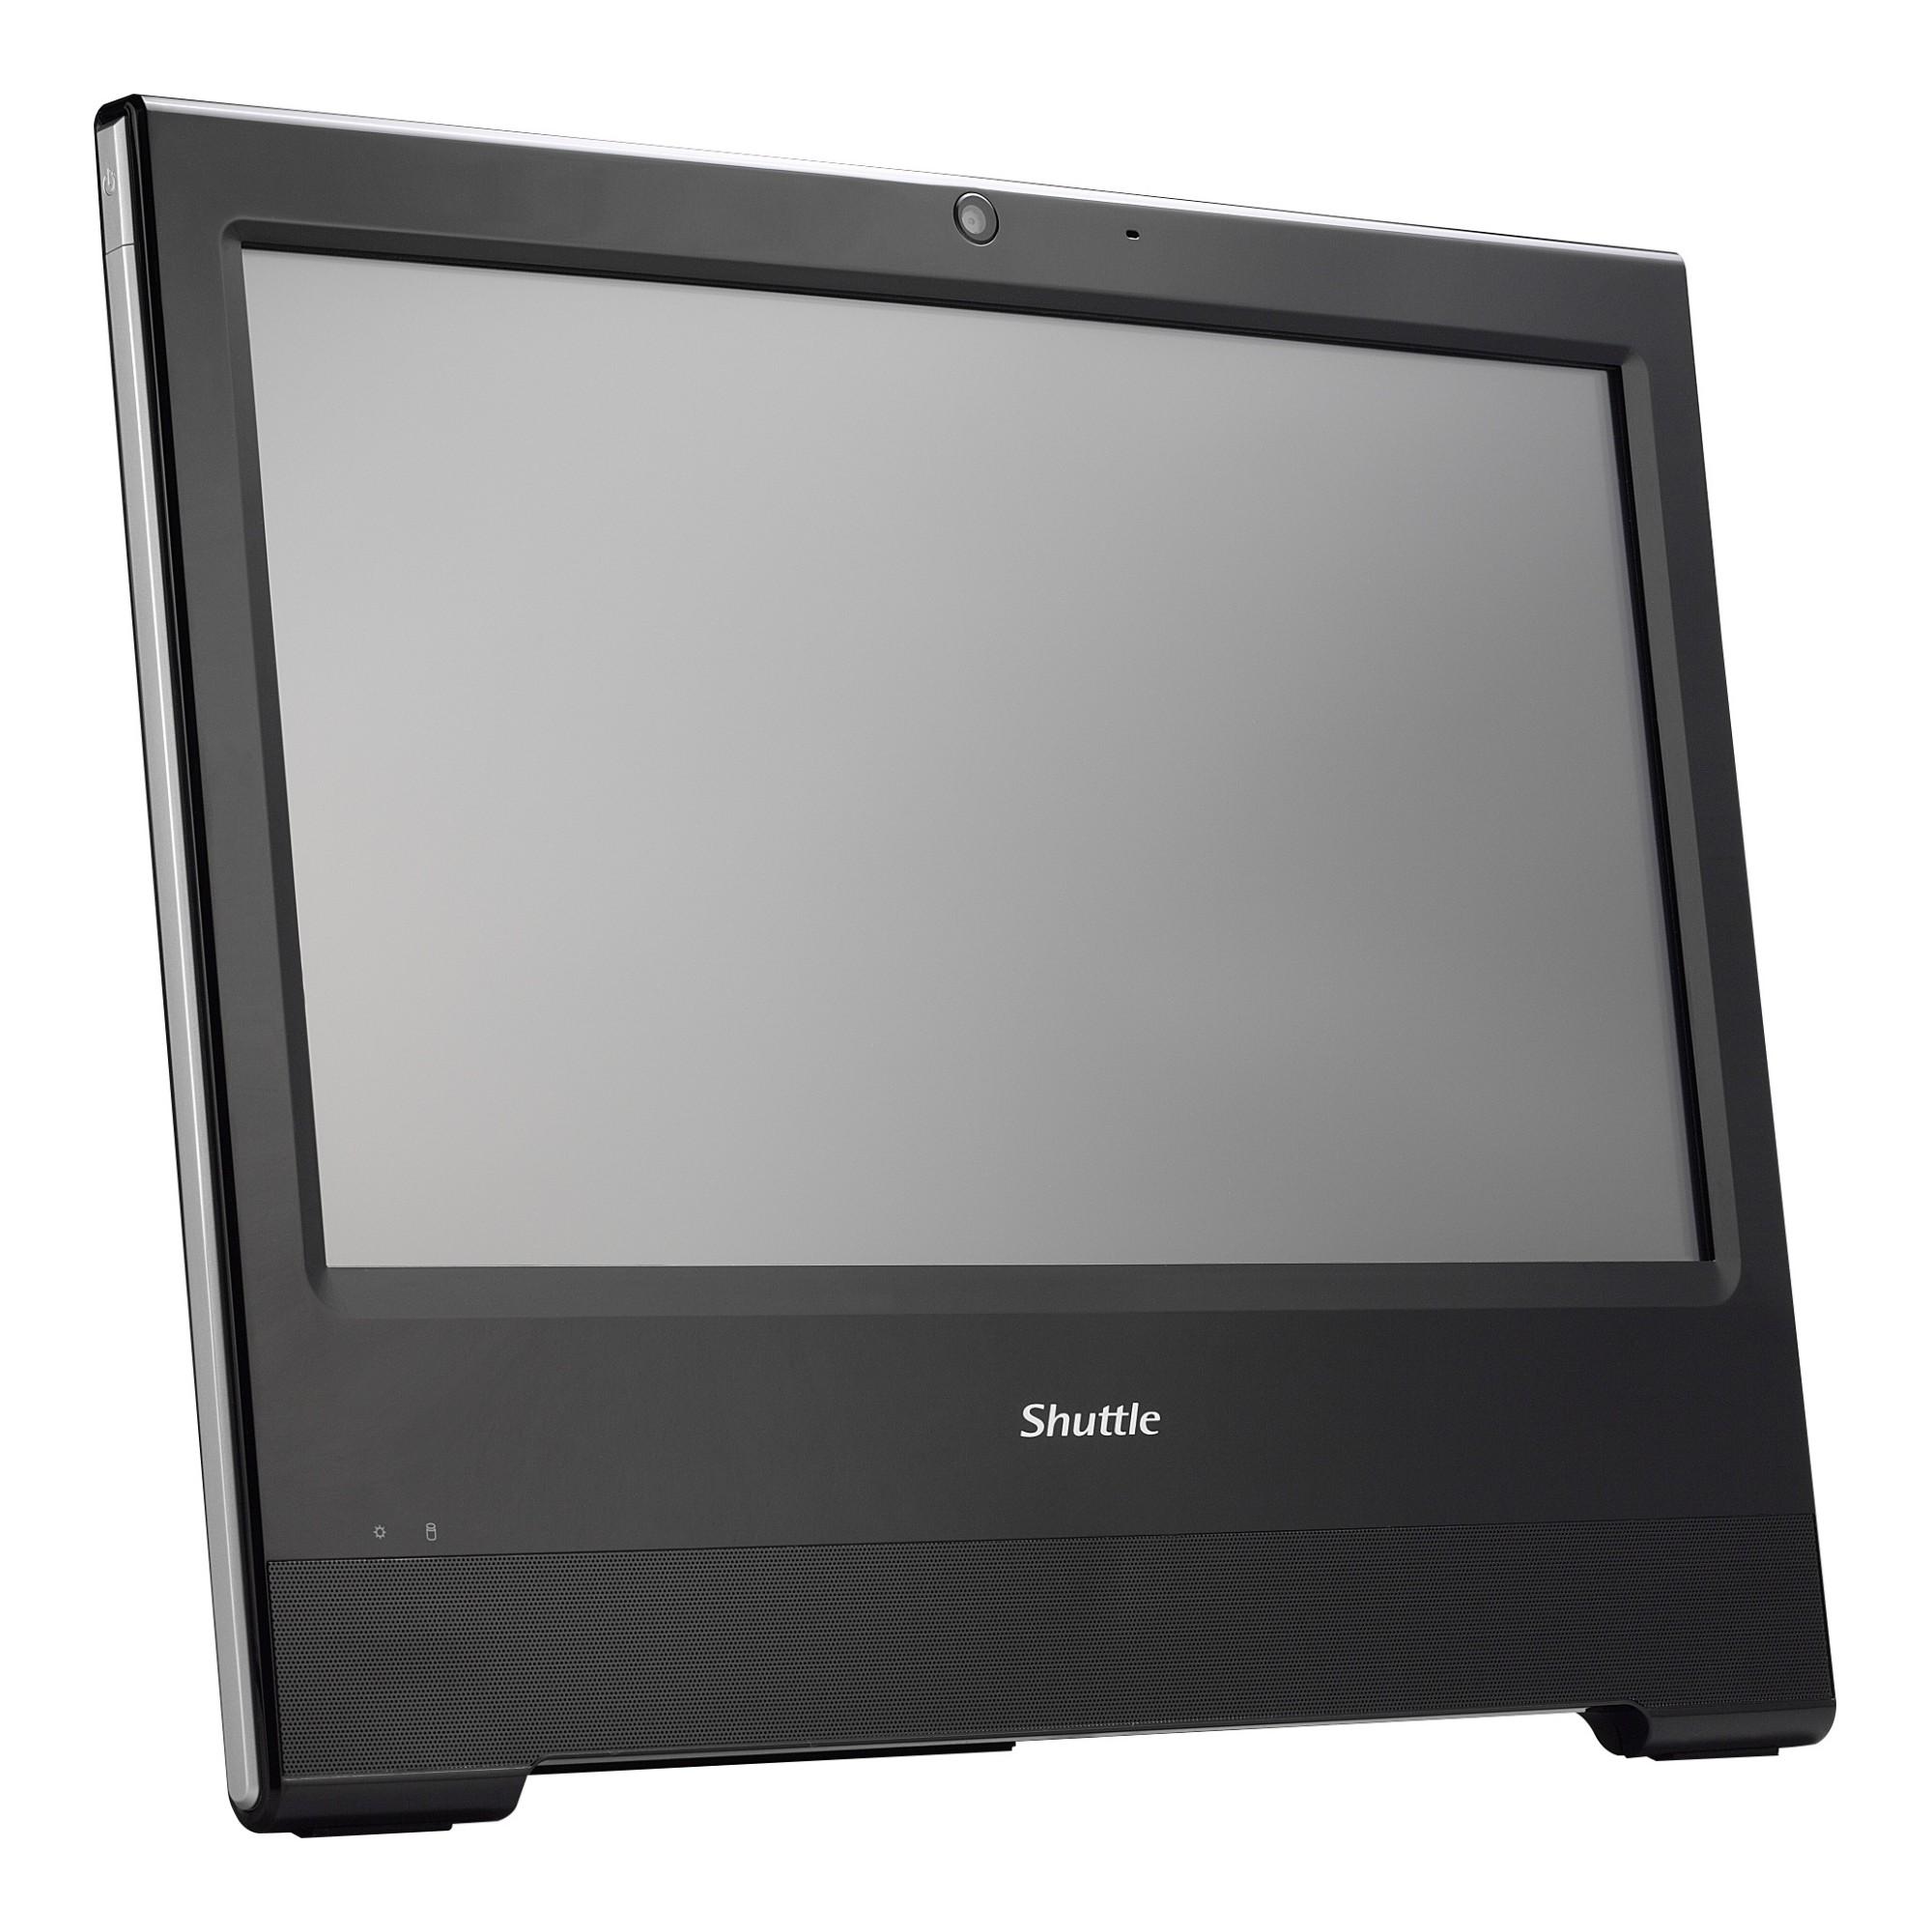 Shuttle XPС slim X50V6 (black) Intel SoC BGA 1356 1.8GHz 3865U All-in-One Black